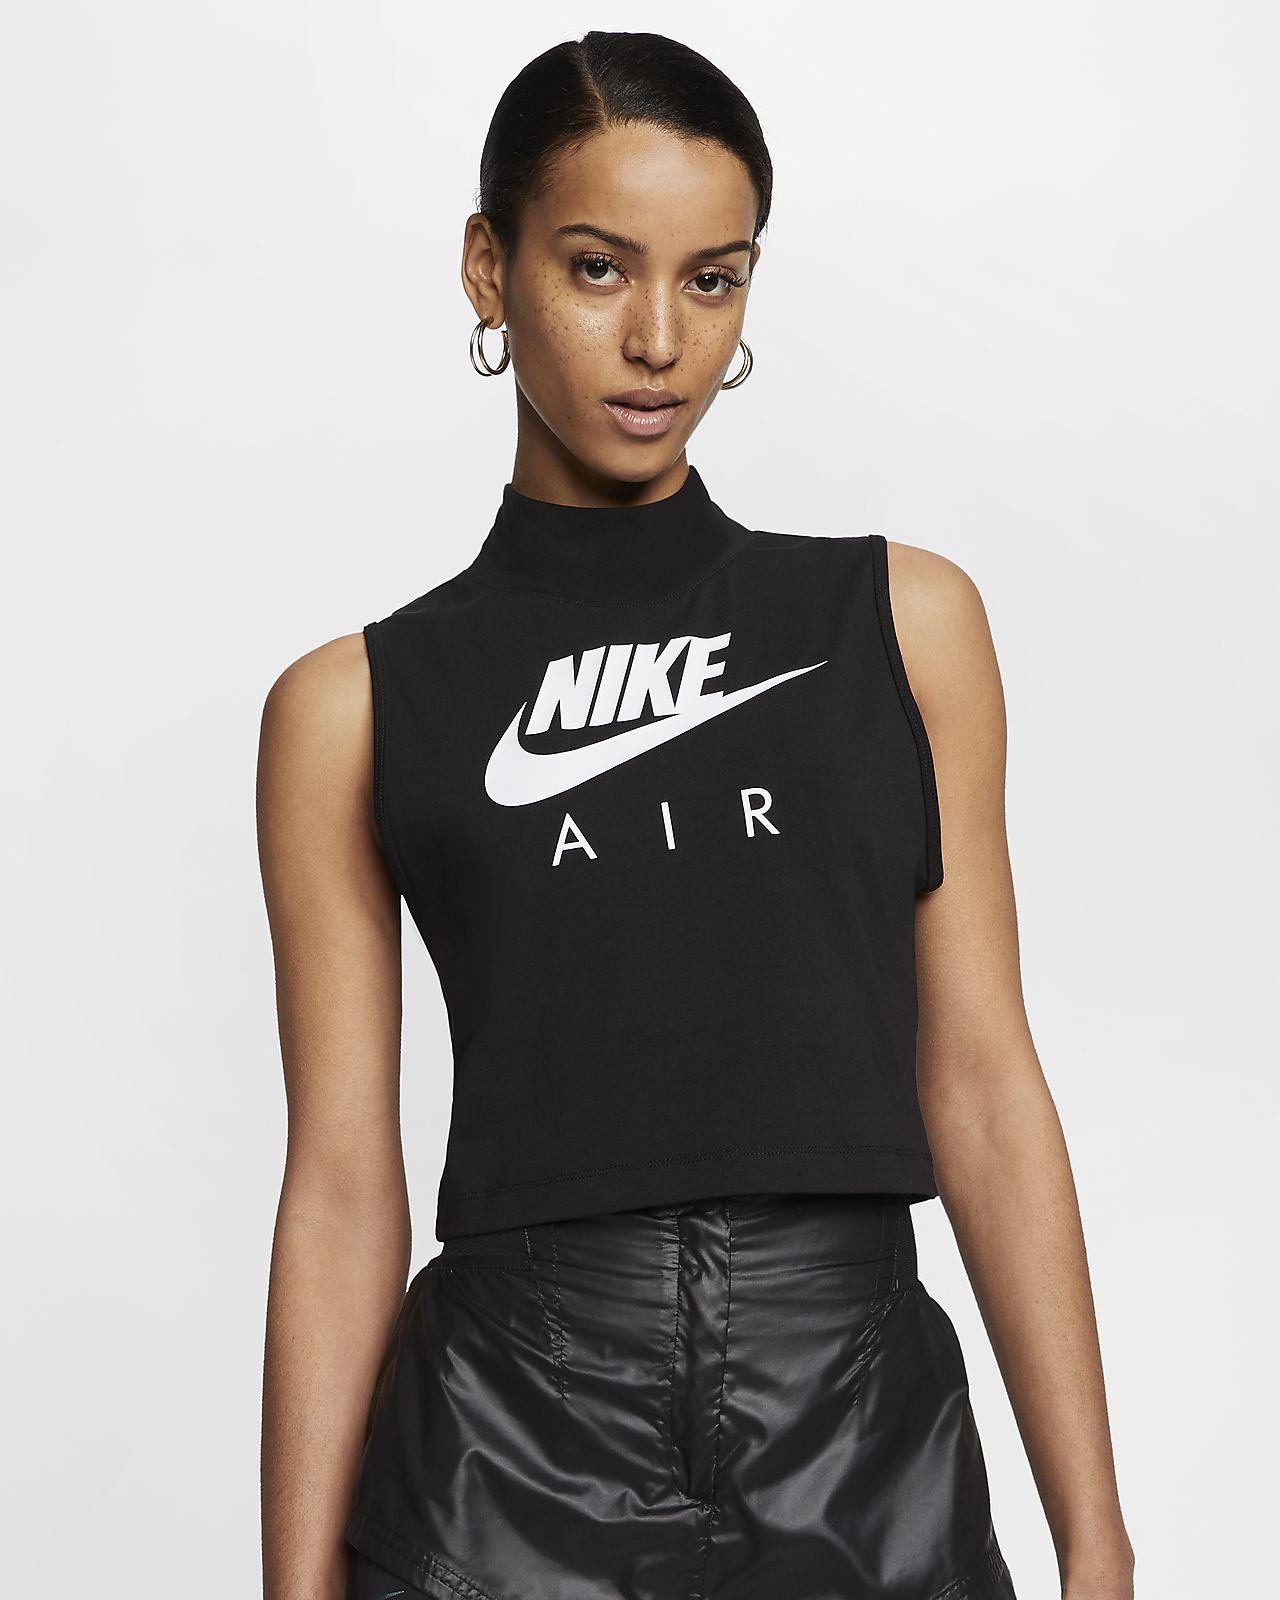 Nike Air női állógalléros trikó